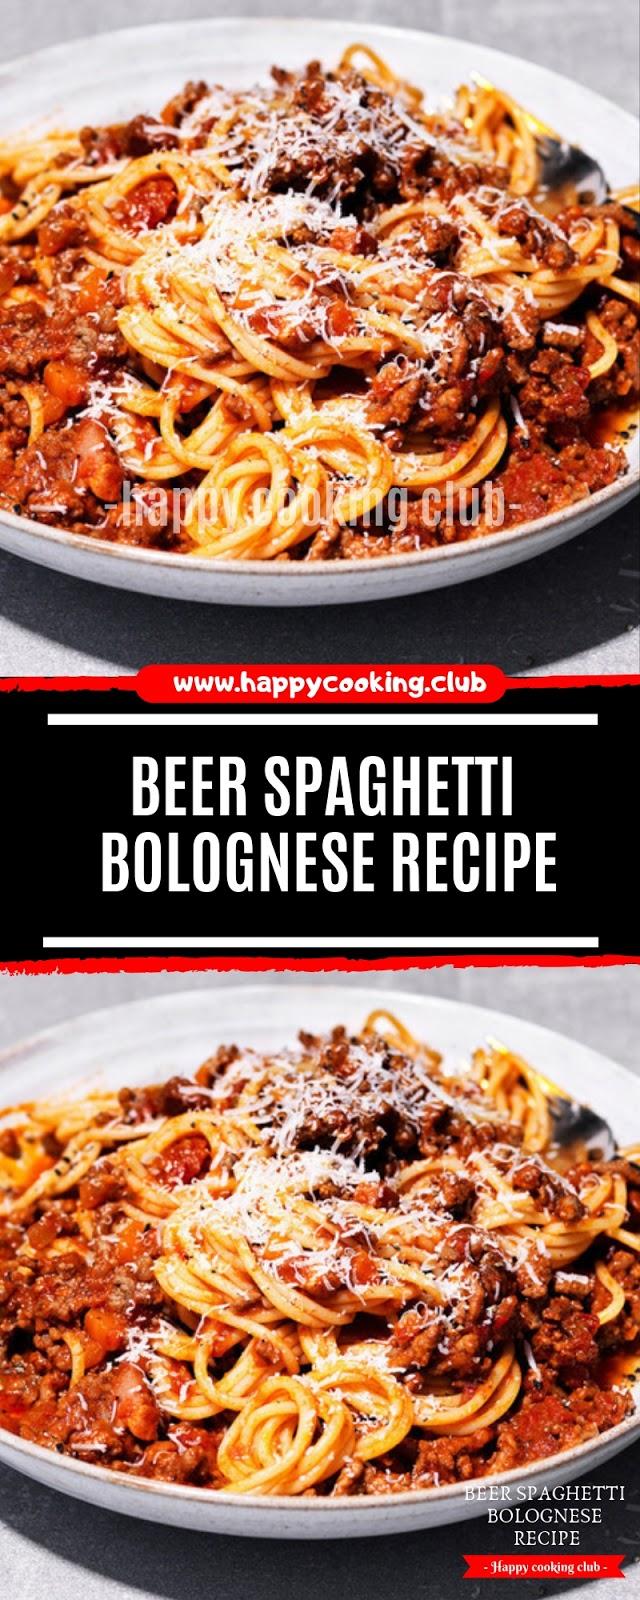 Beer Spaghetti Bolognese Recipe